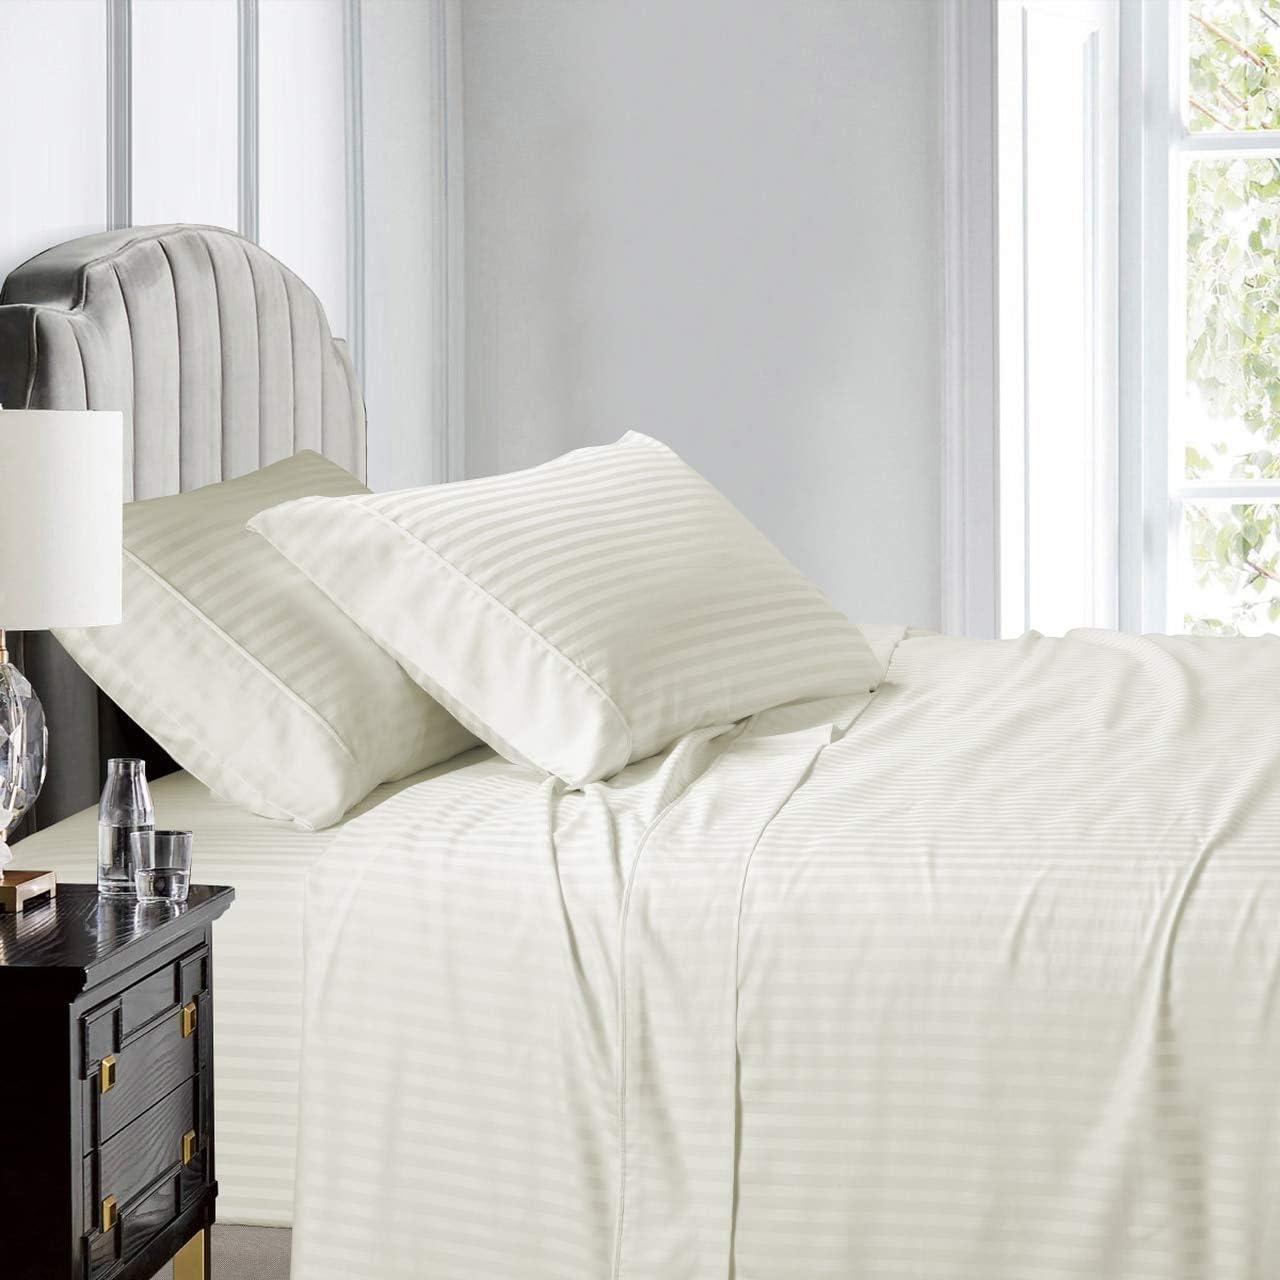 COTTONWALAS True Heavy Supima ELS Cotton Size Twin Cheap SALE Start XL Shee Max 81% OFF 4-PCs